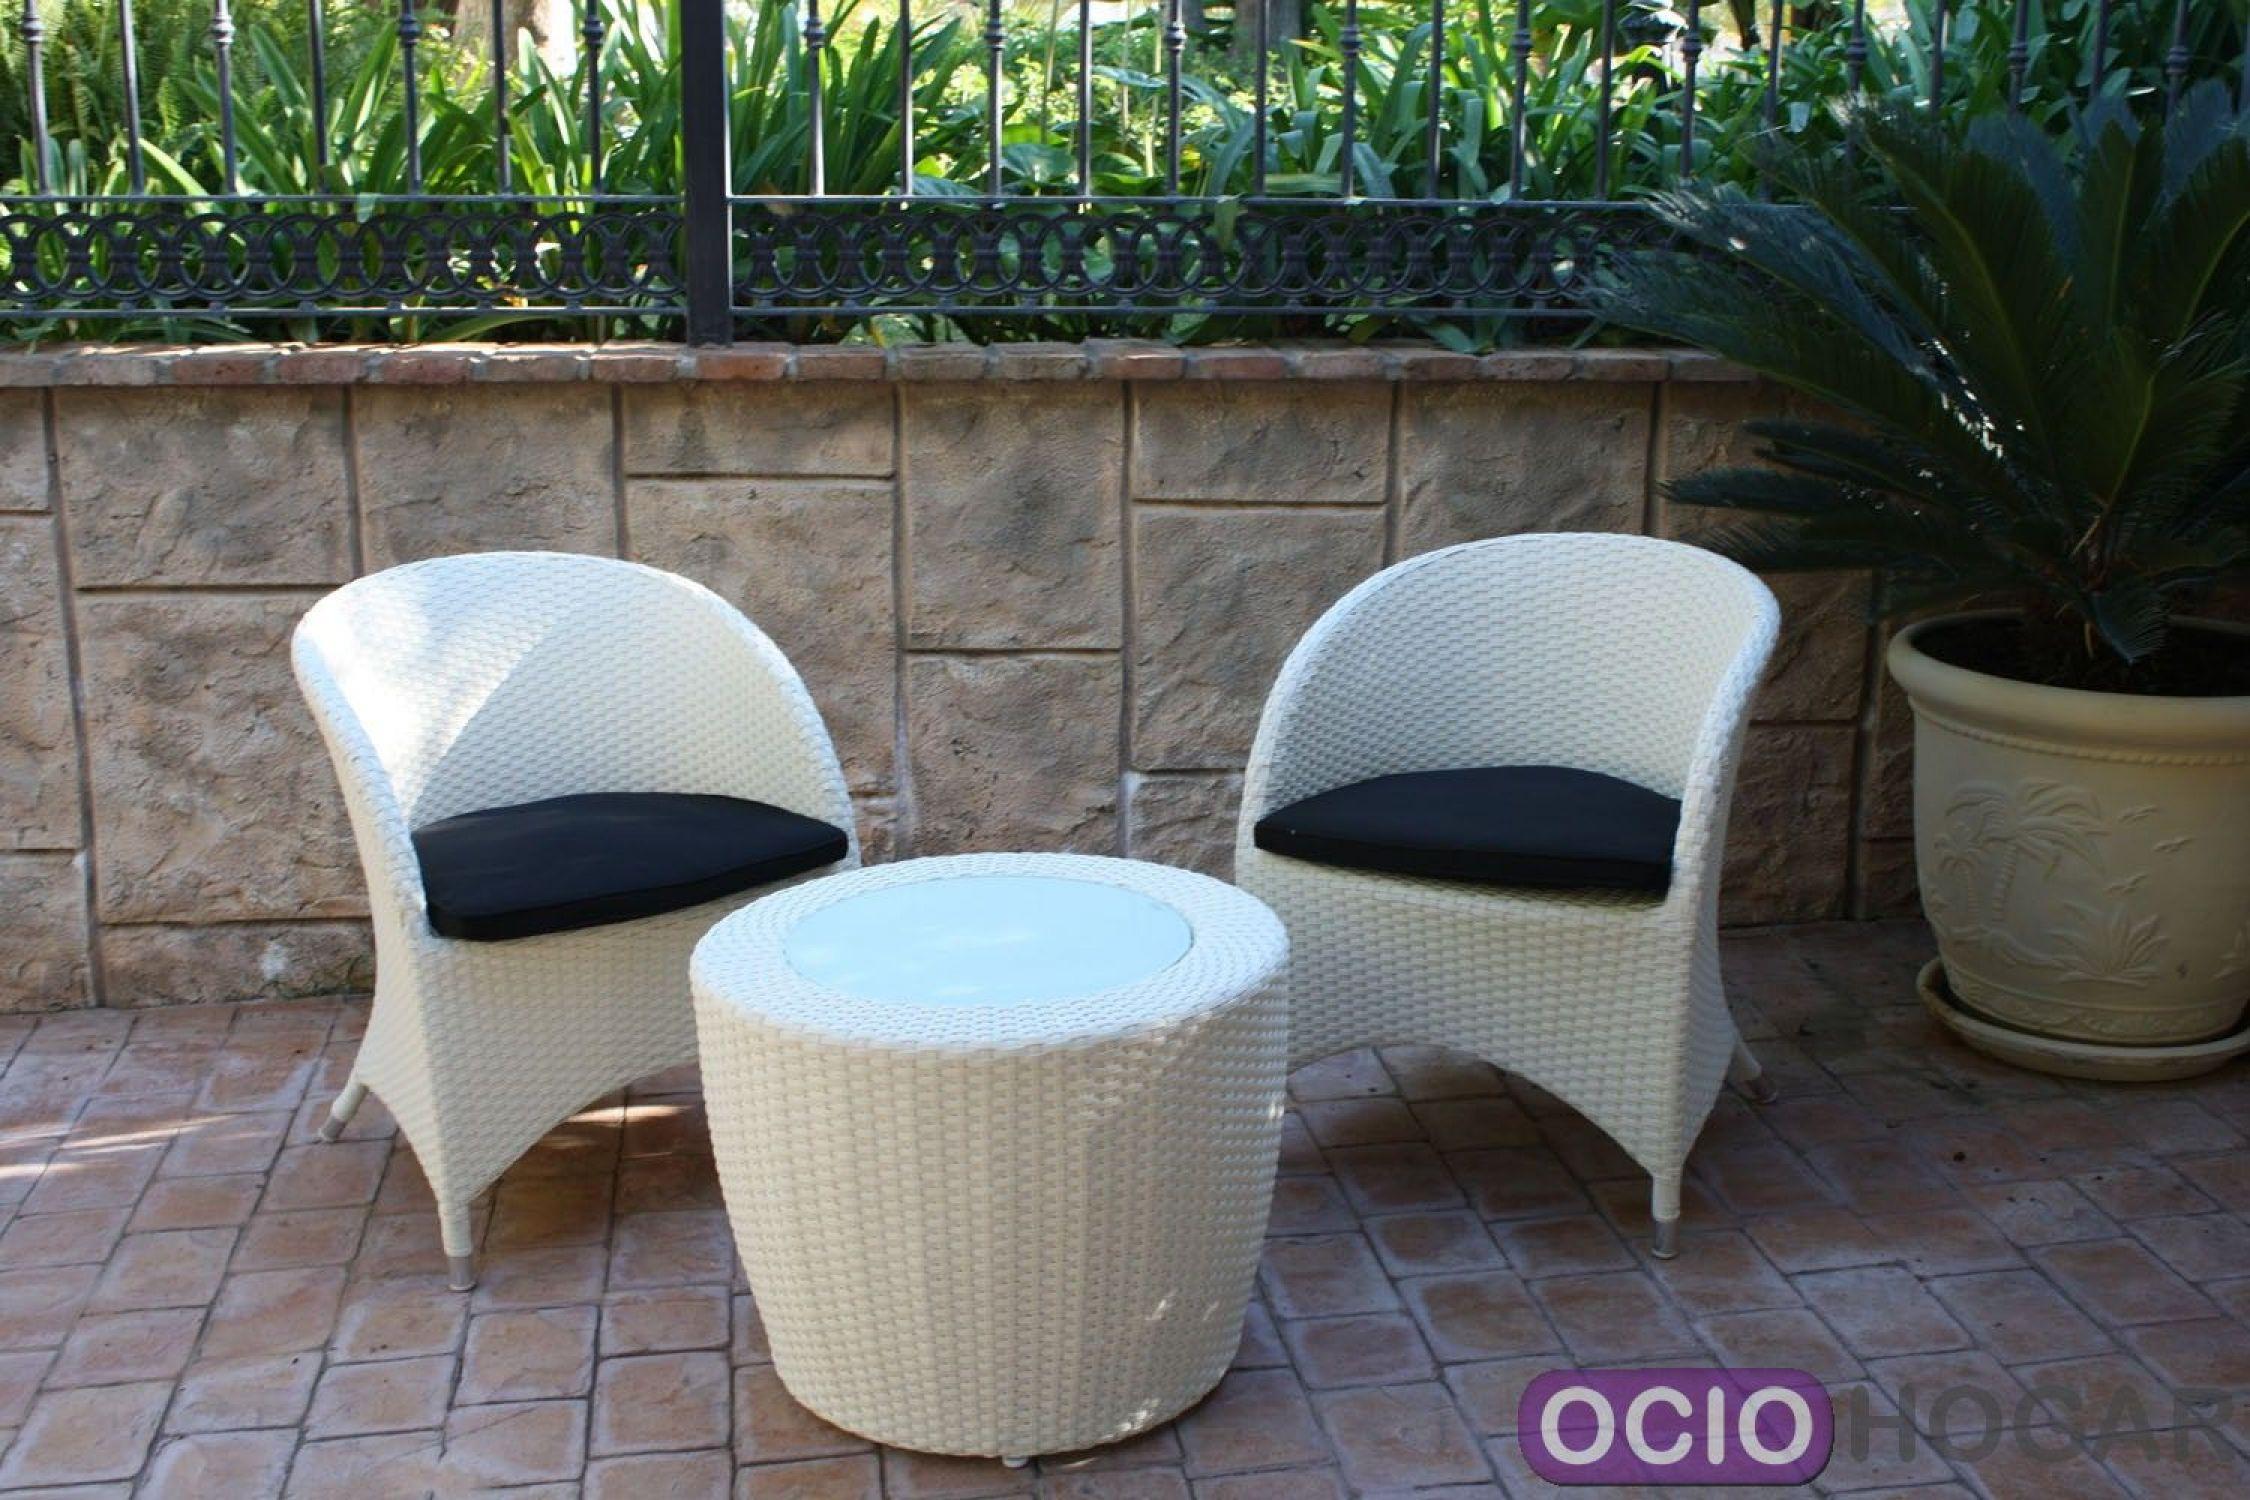 Pin mesa y sillones de jard n on pinterest for Sillones para jardin baratos